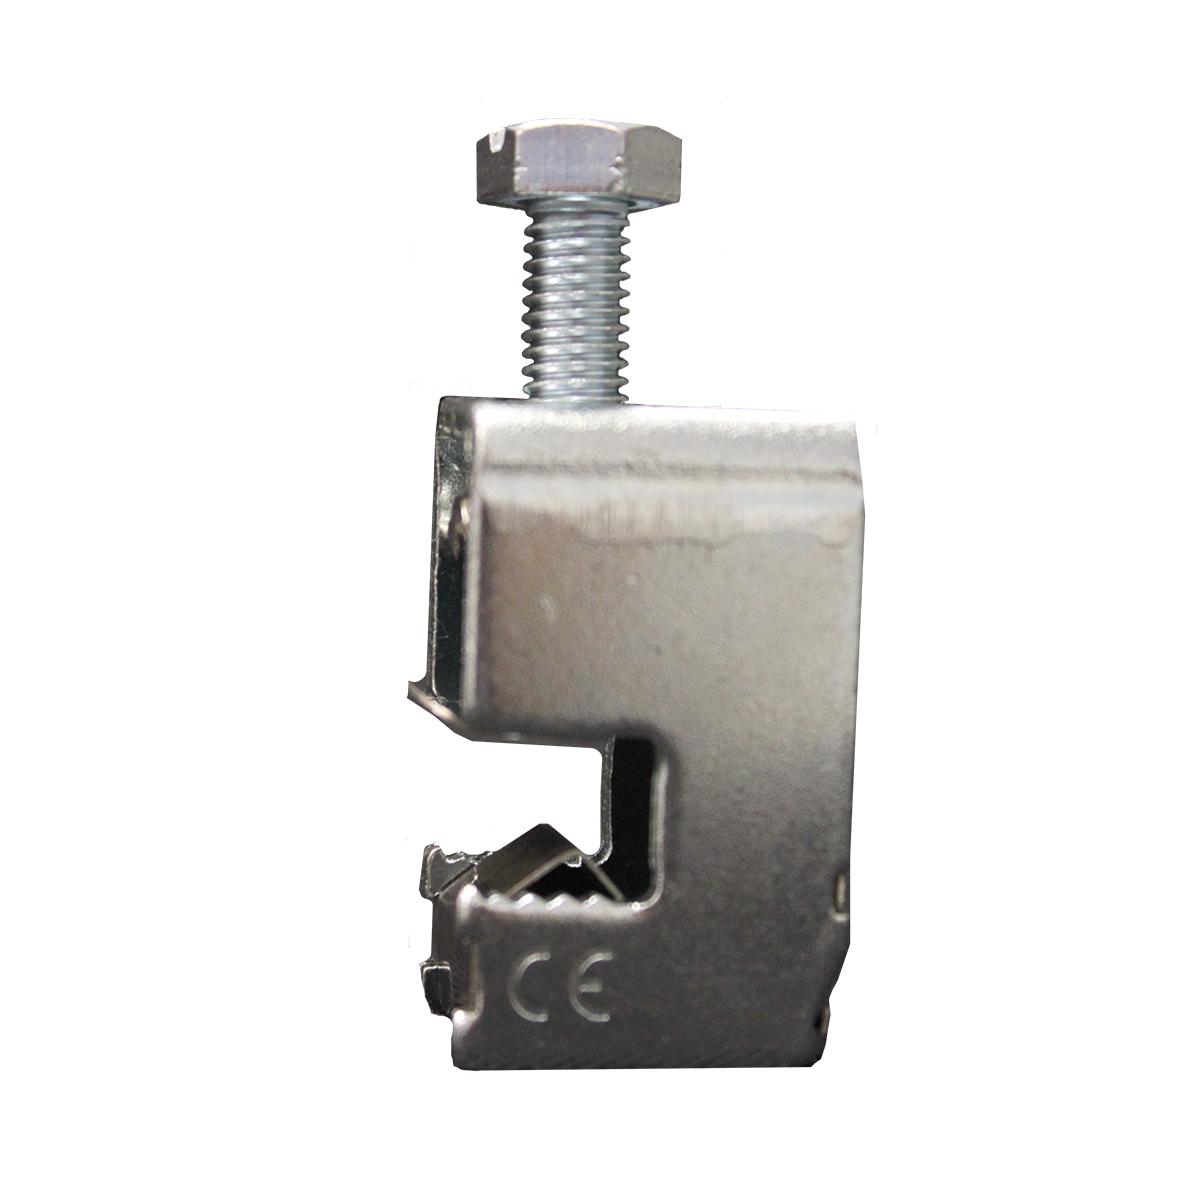 1 Stk Alu-Kupfer-Leiteranschlußklemme 16 -120mm² / 5mm² IS5051205-